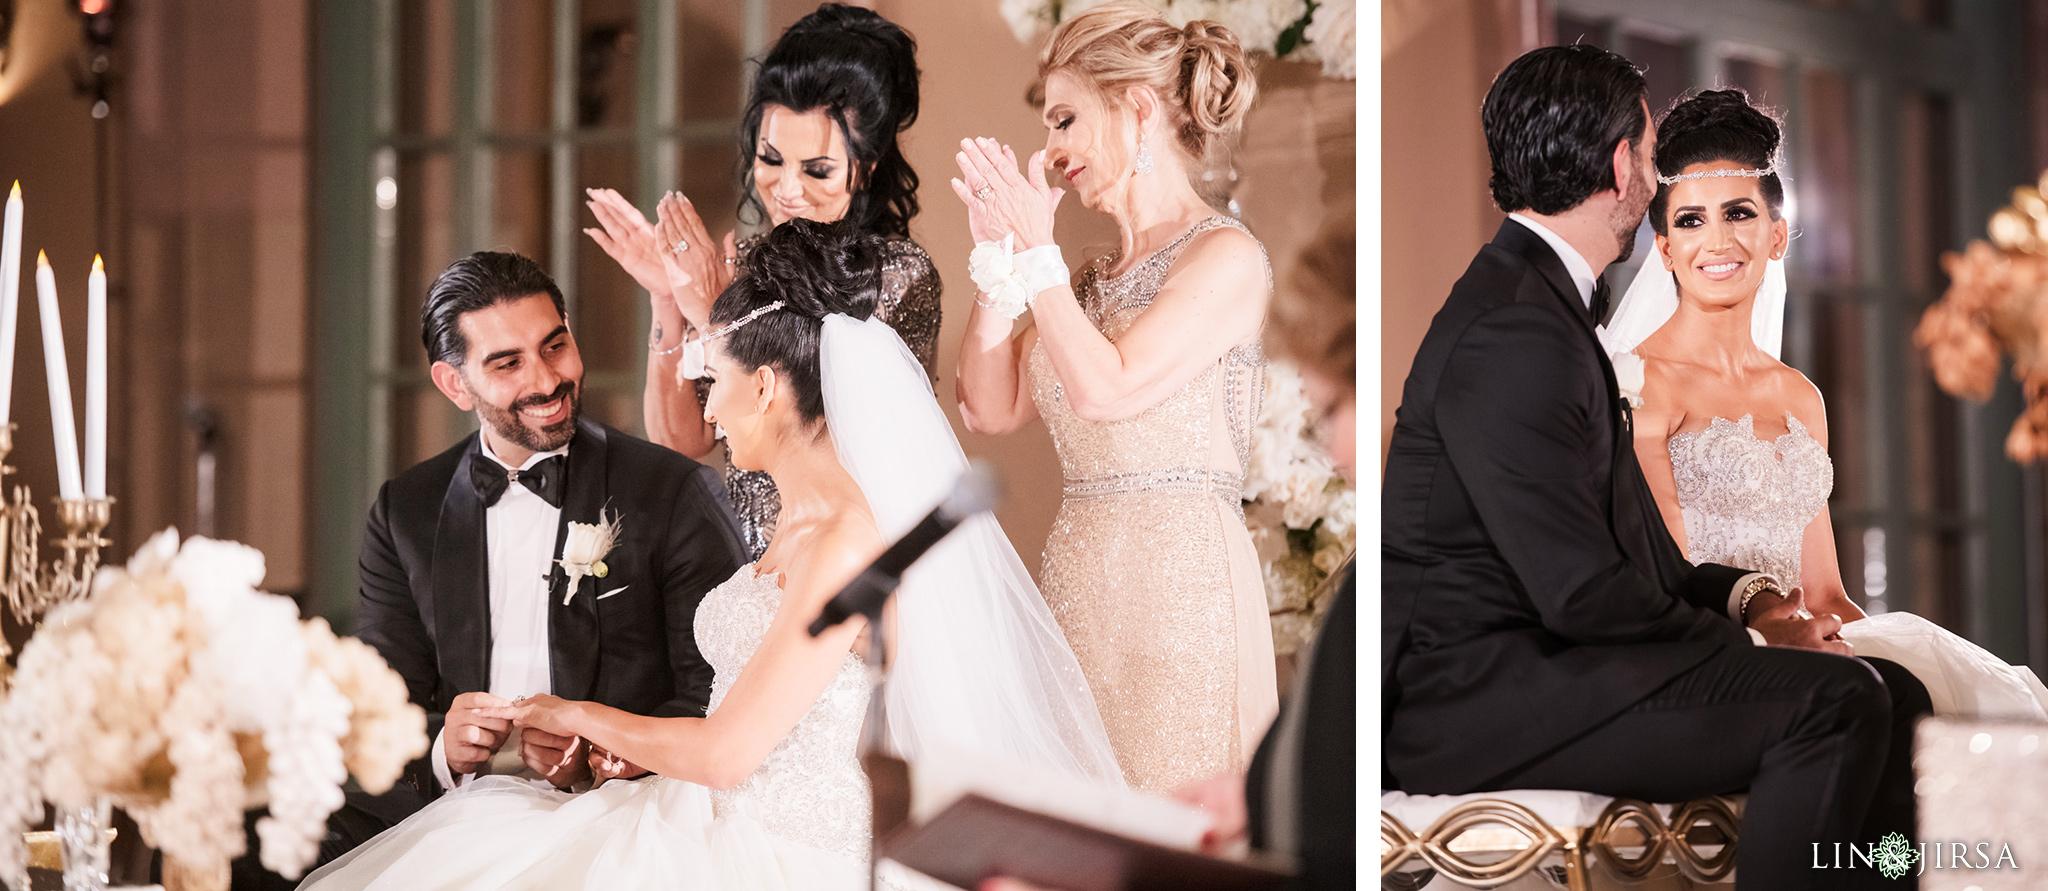 19 Biltmore Hotel Los Angeles Wedding Photography